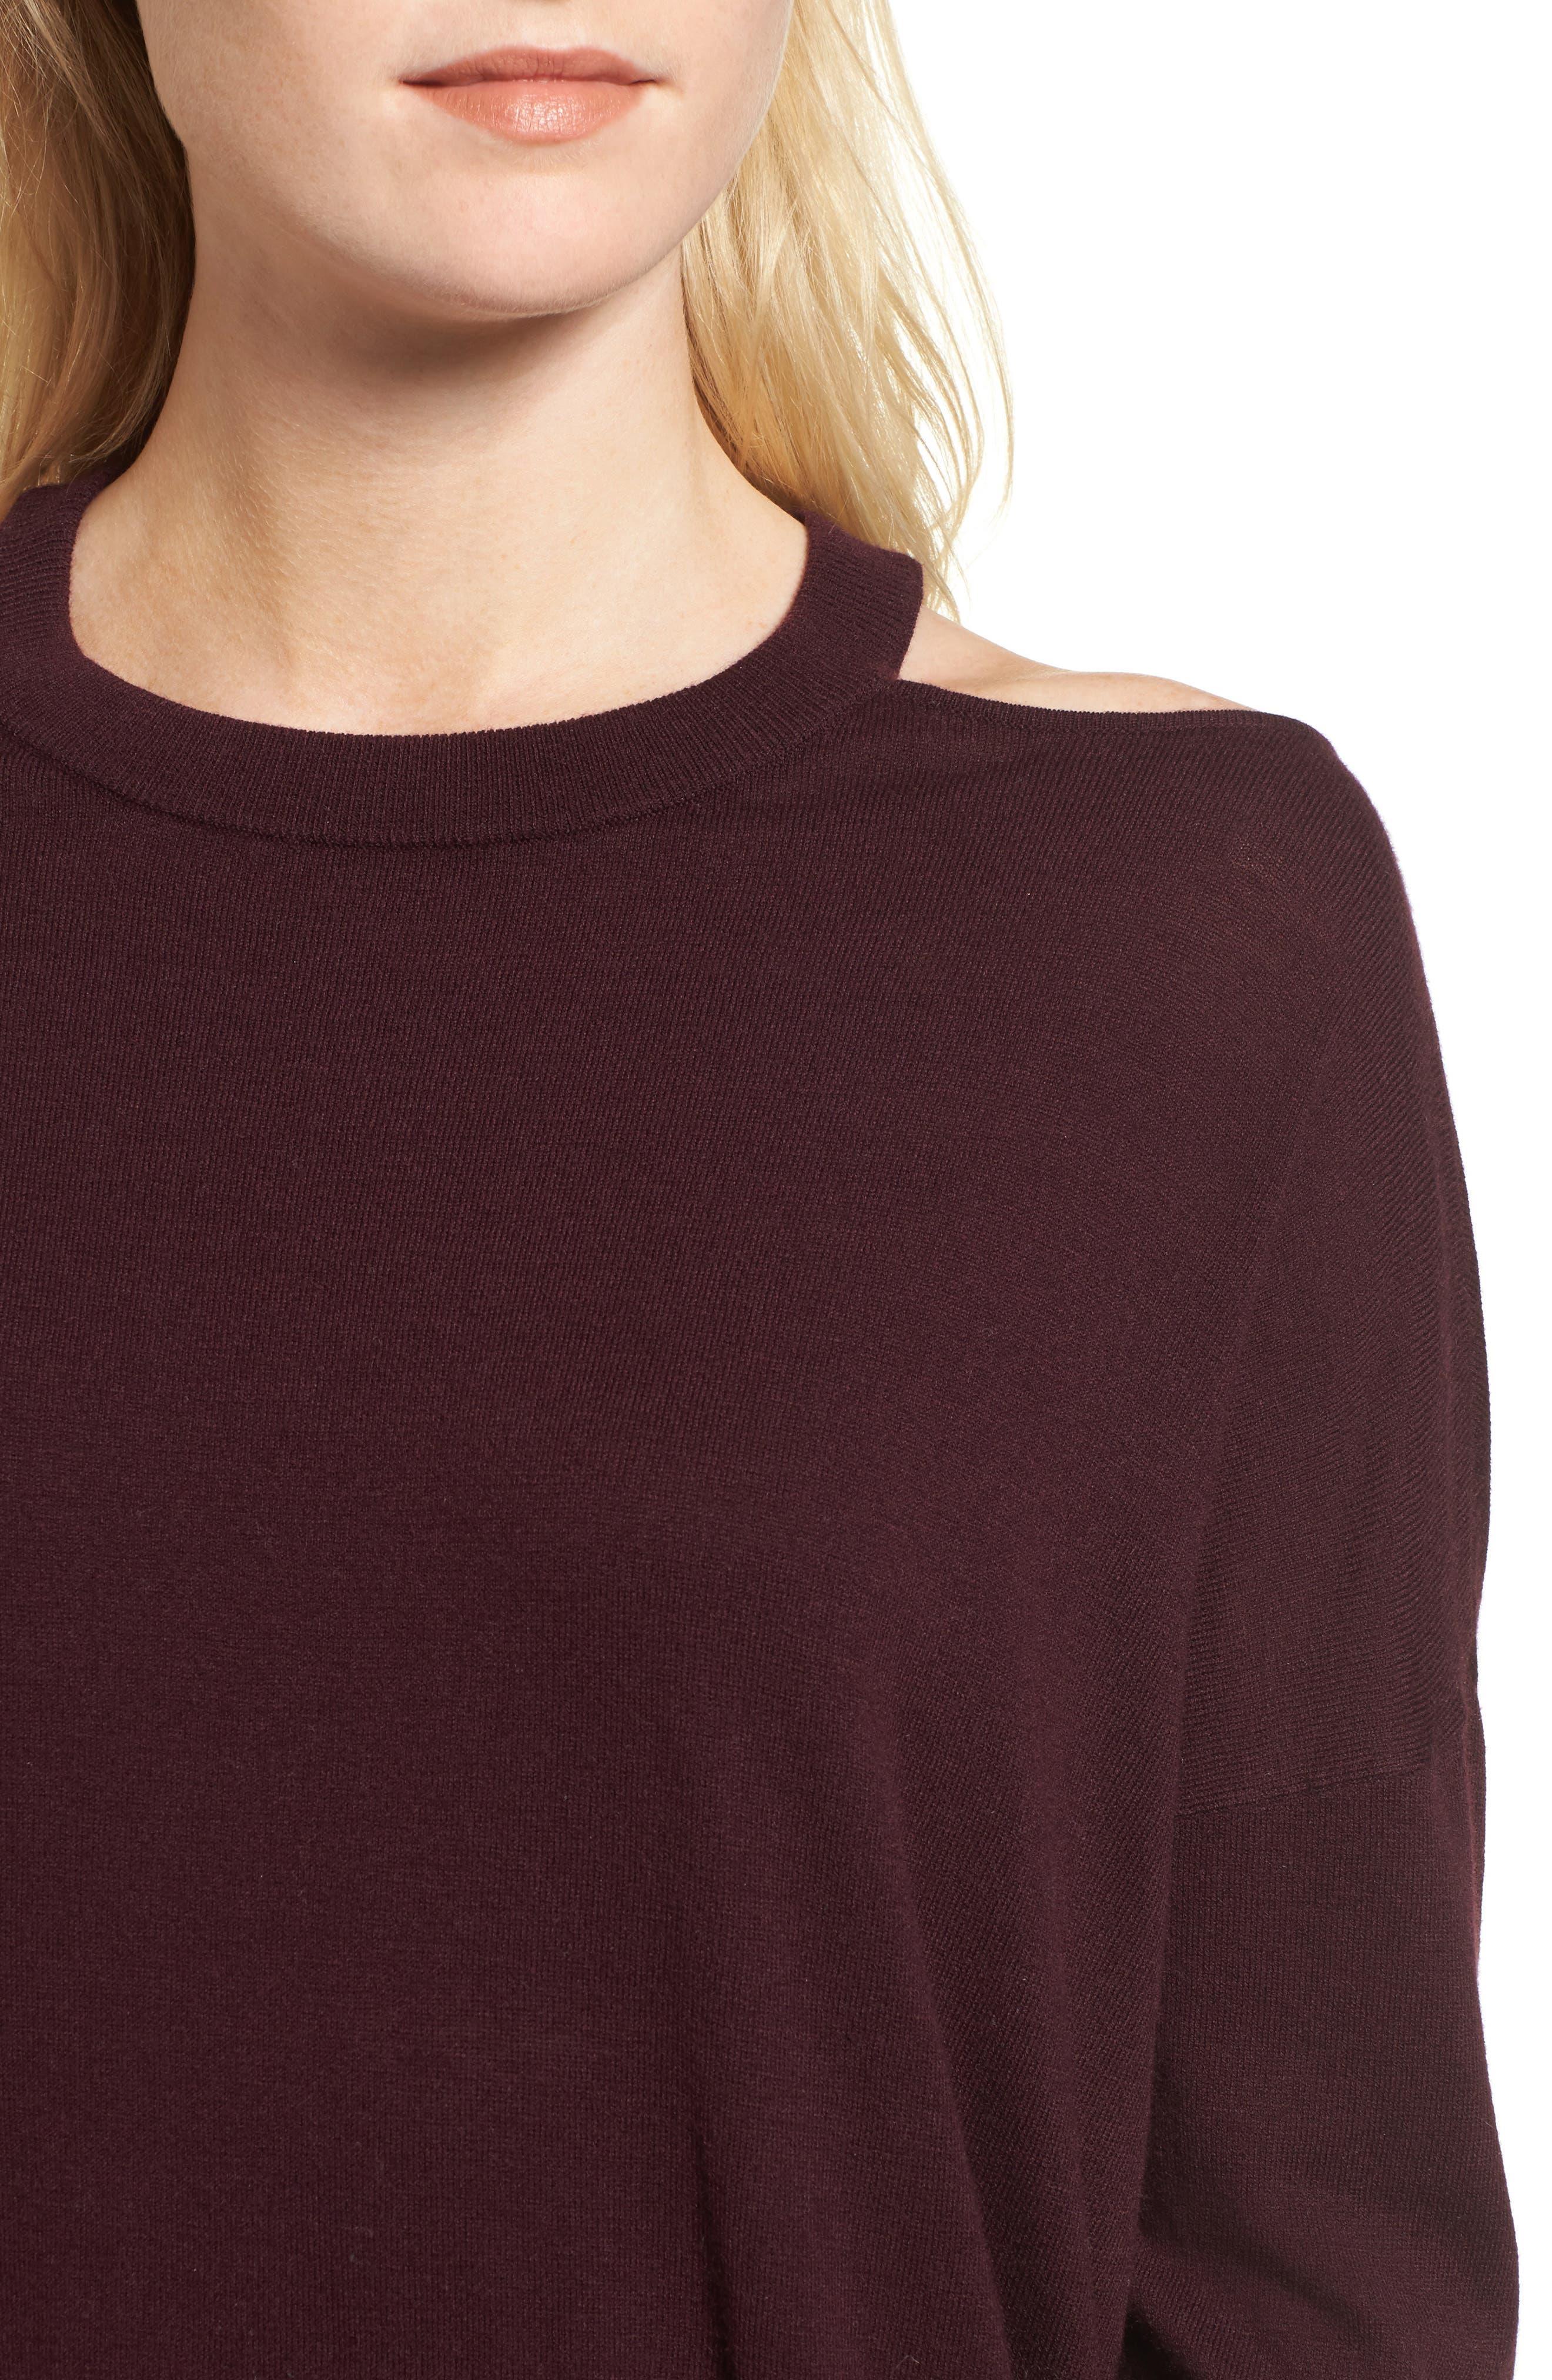 Canarise Cutout Sweater,                             Alternate thumbnail 8, color,